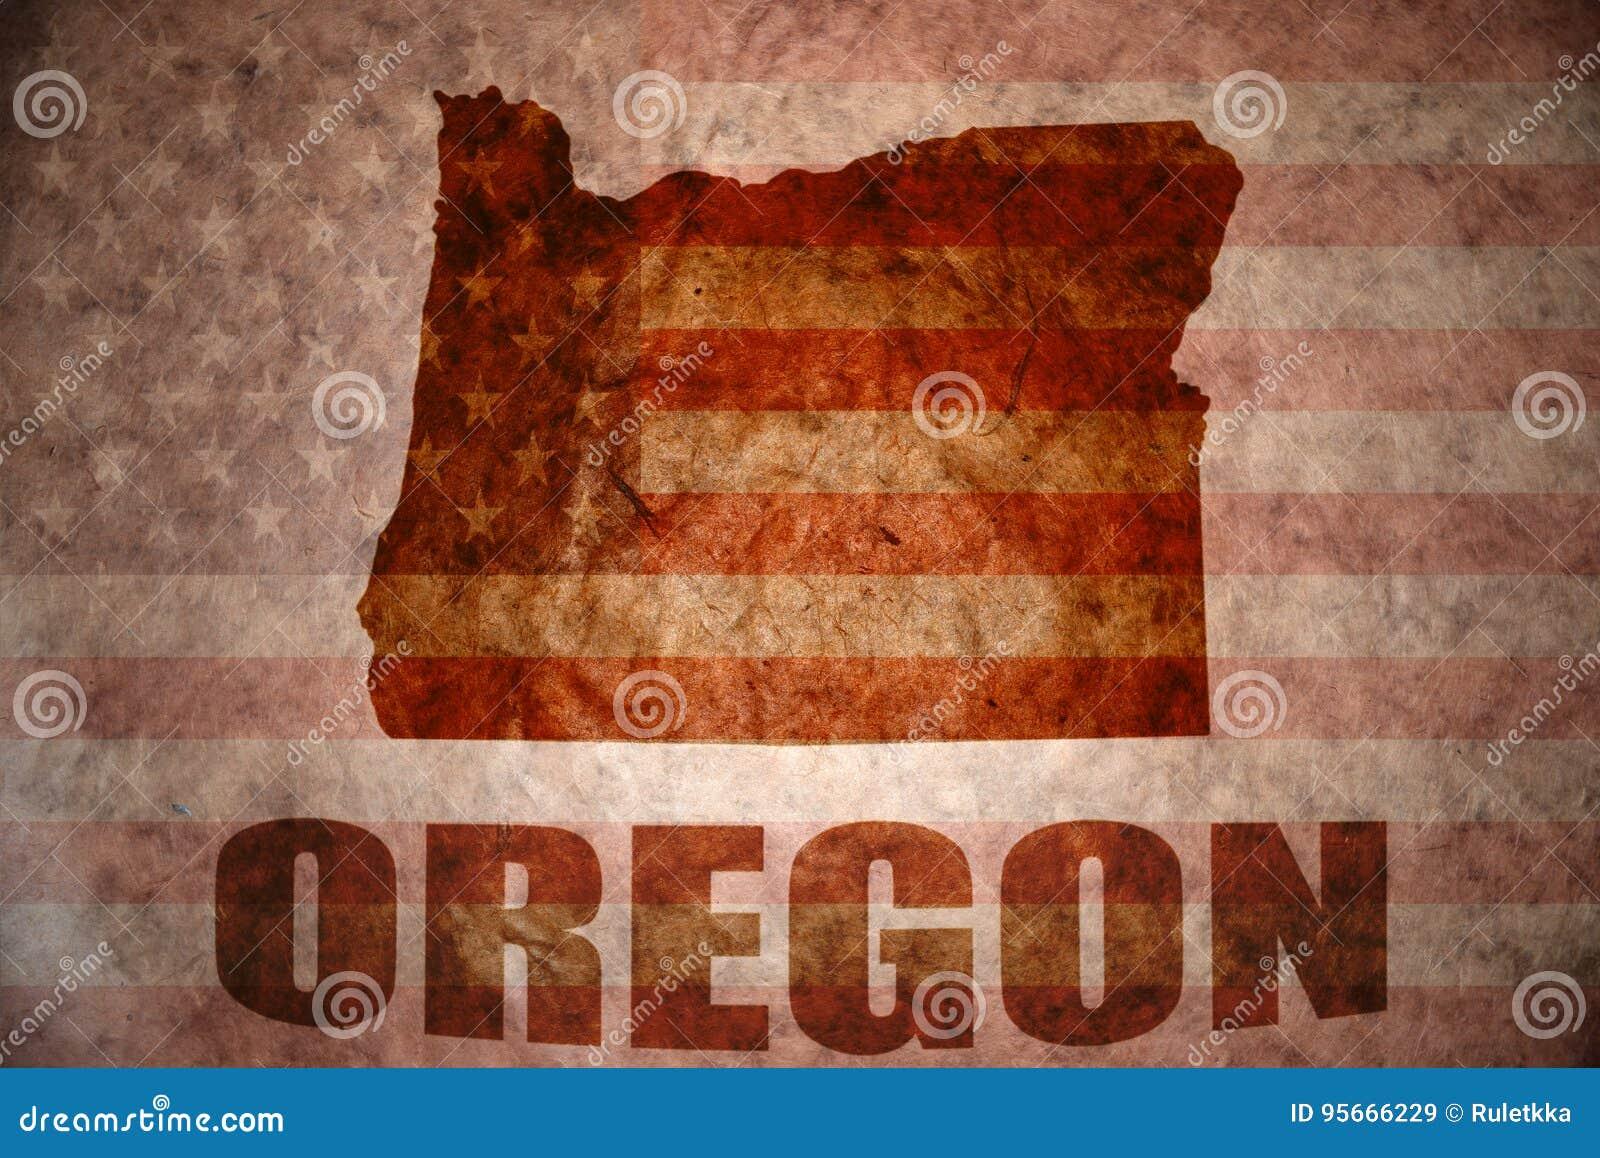 Vintage Oregon Map.Vintage Oregon Map Stock Image Image Of Discovery Papyrus 95666229